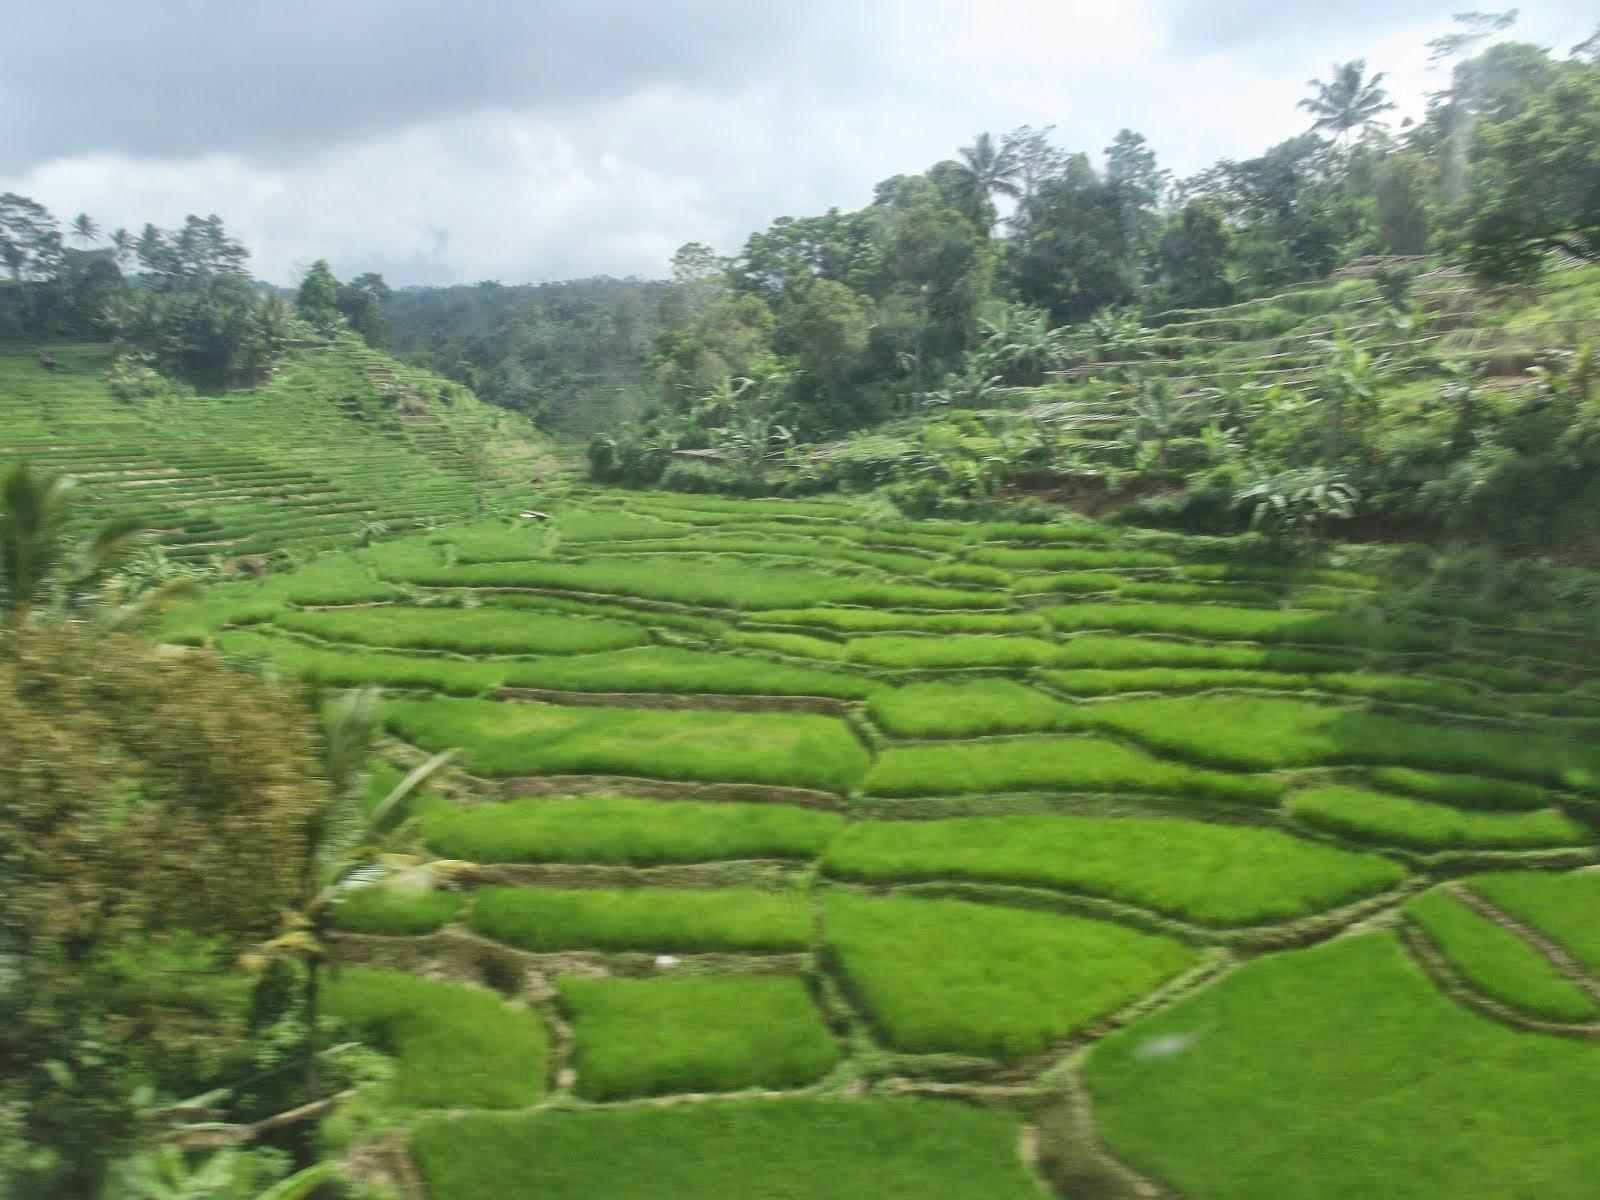 Pemandangan Alam Purwakarta, Jawa Barat, Indonesia